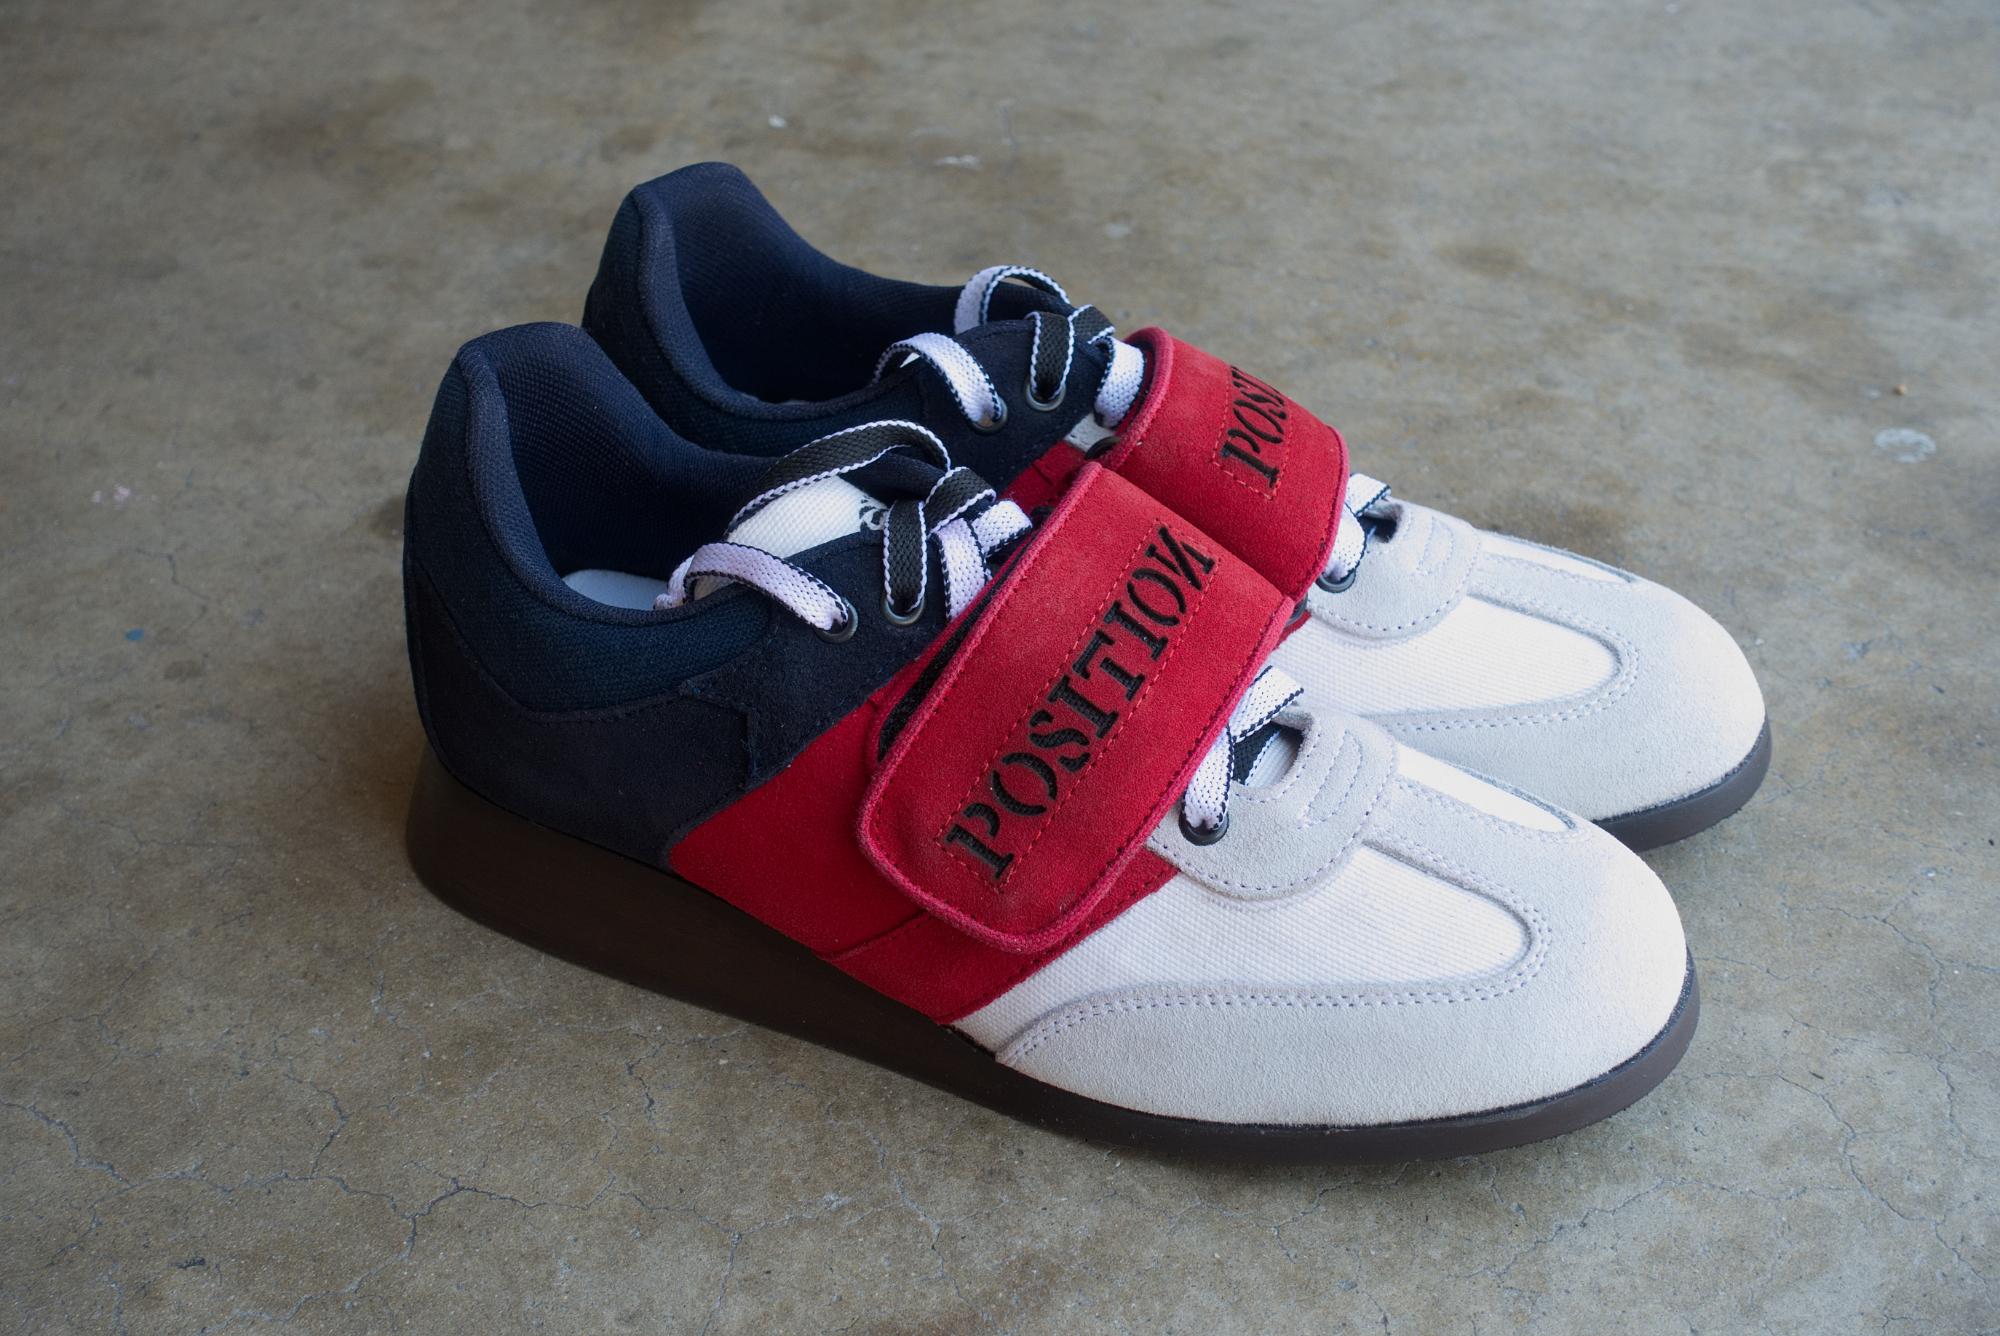 mark bell powerlifting shoes, Reebok